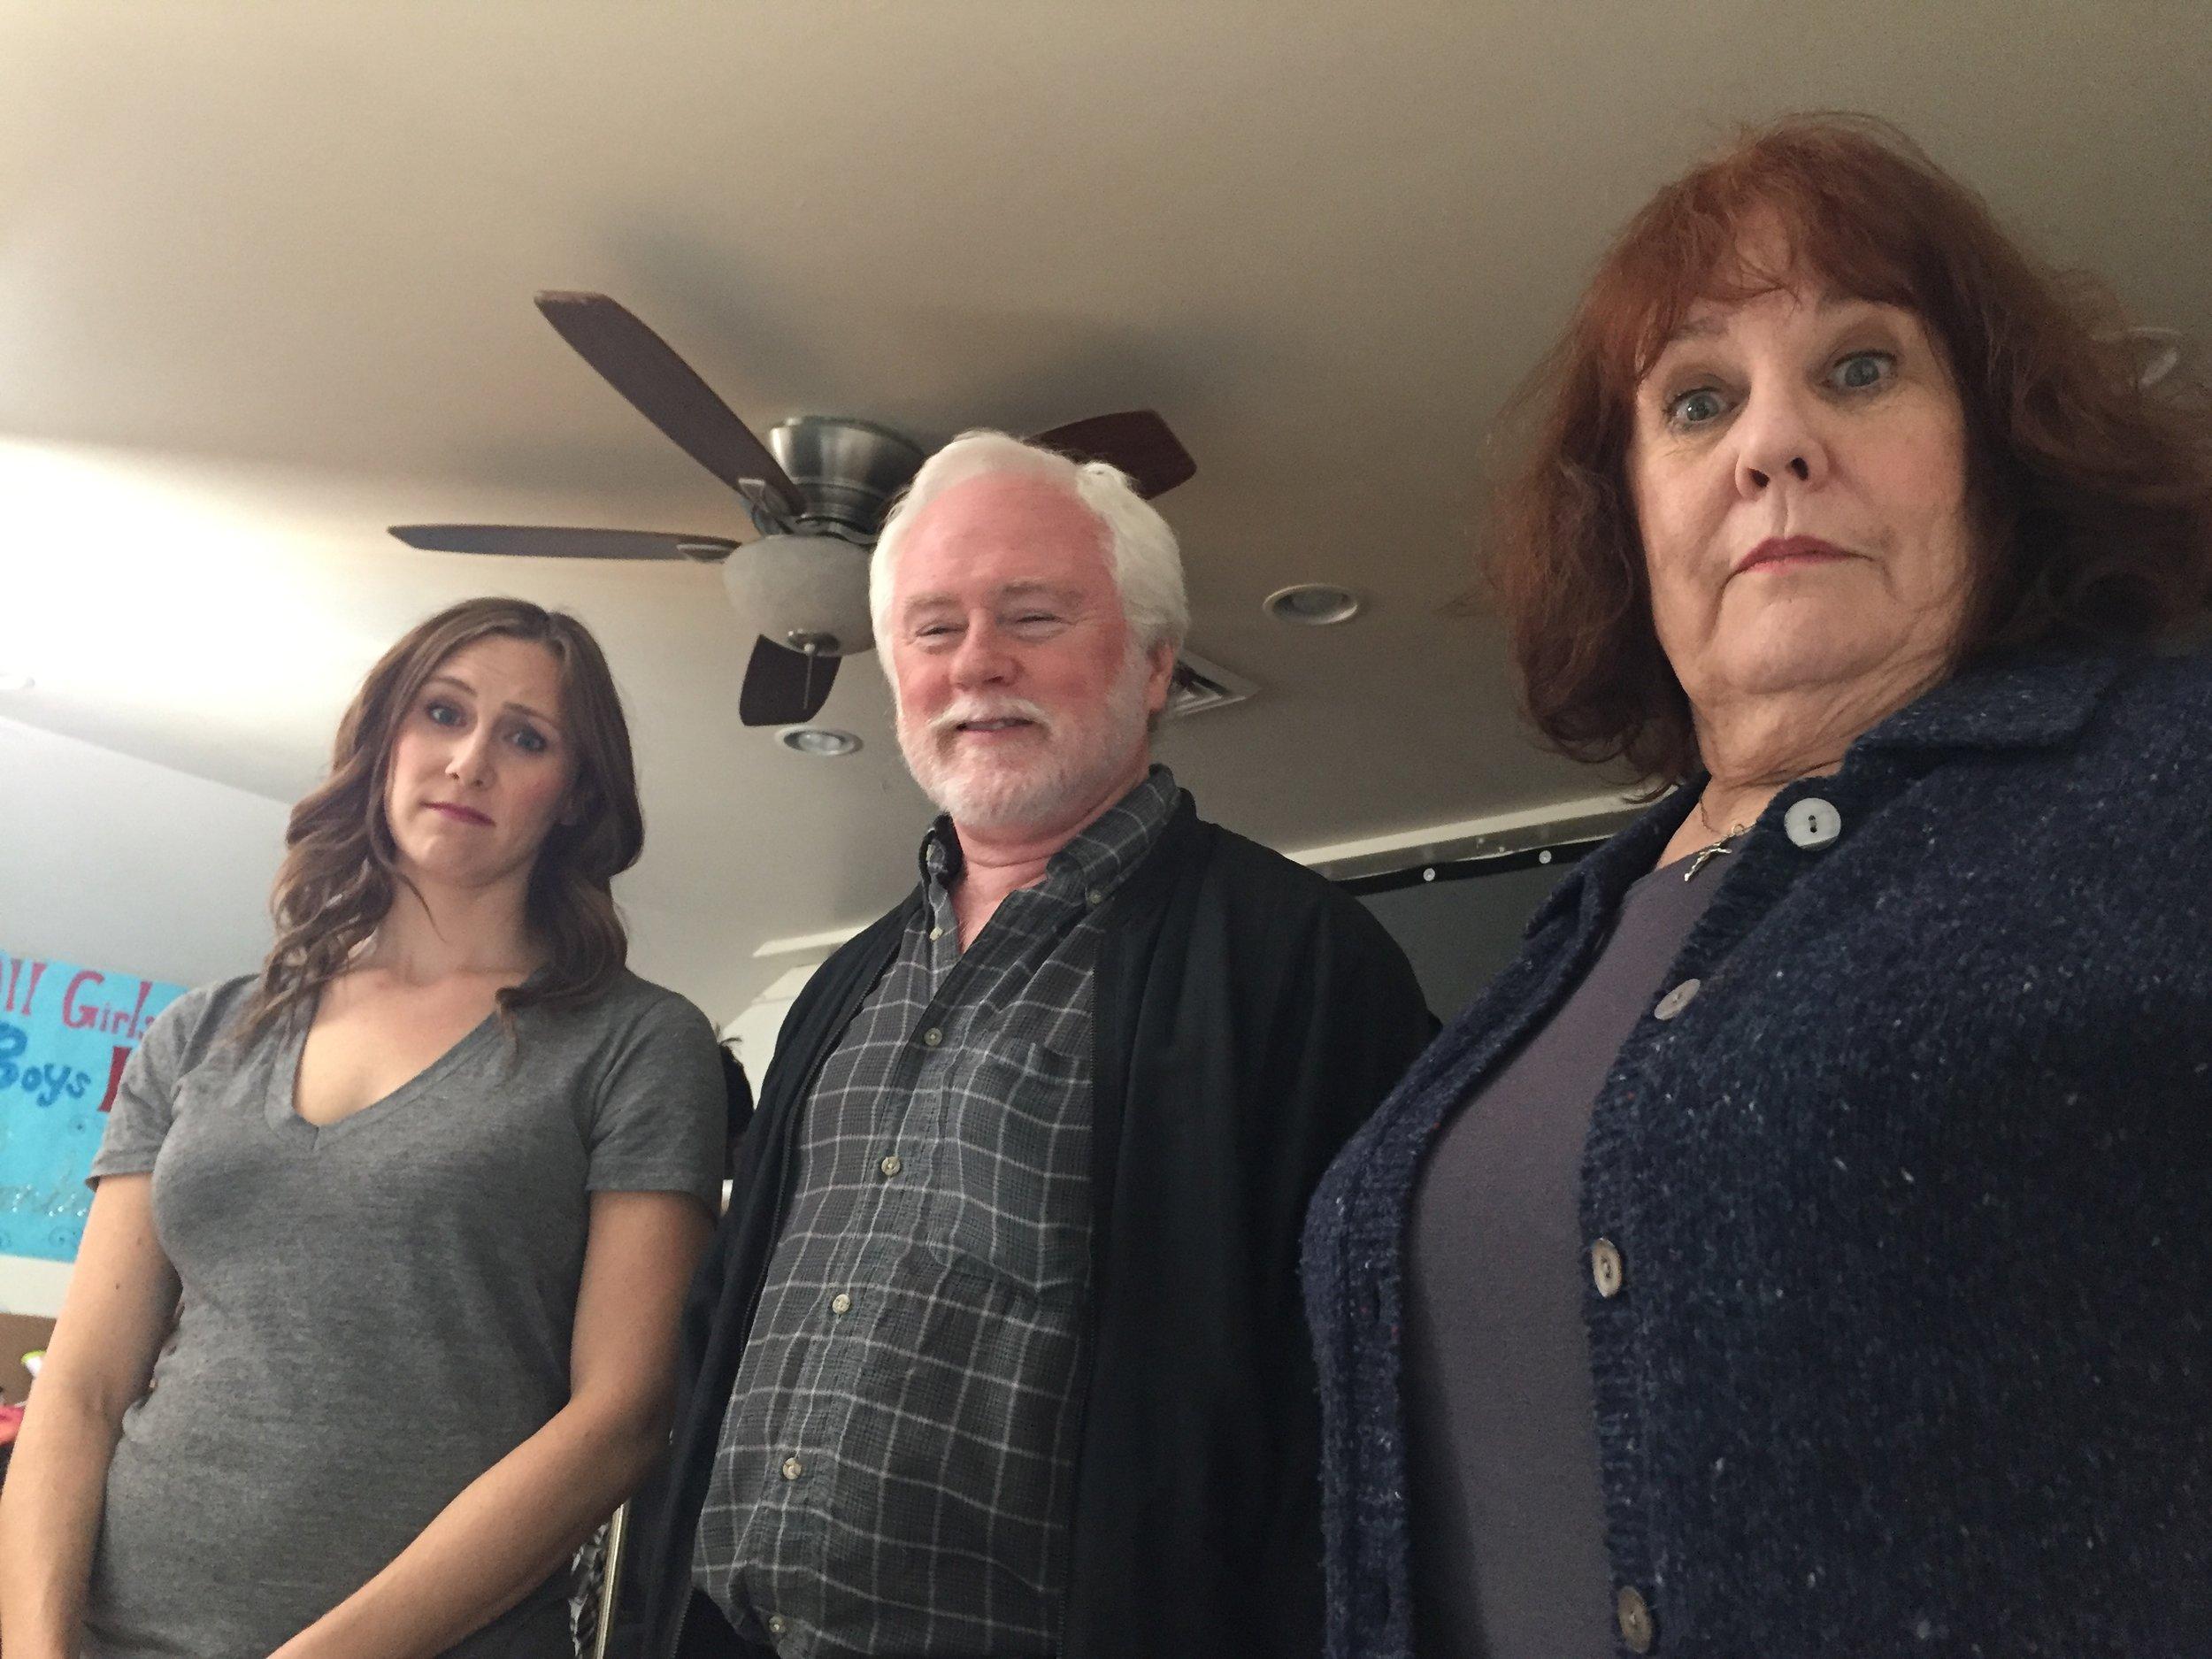 Left to Right: Caley Rose as Jo, Edmund Lupinski as Mo, Carol Kline as Maggie.